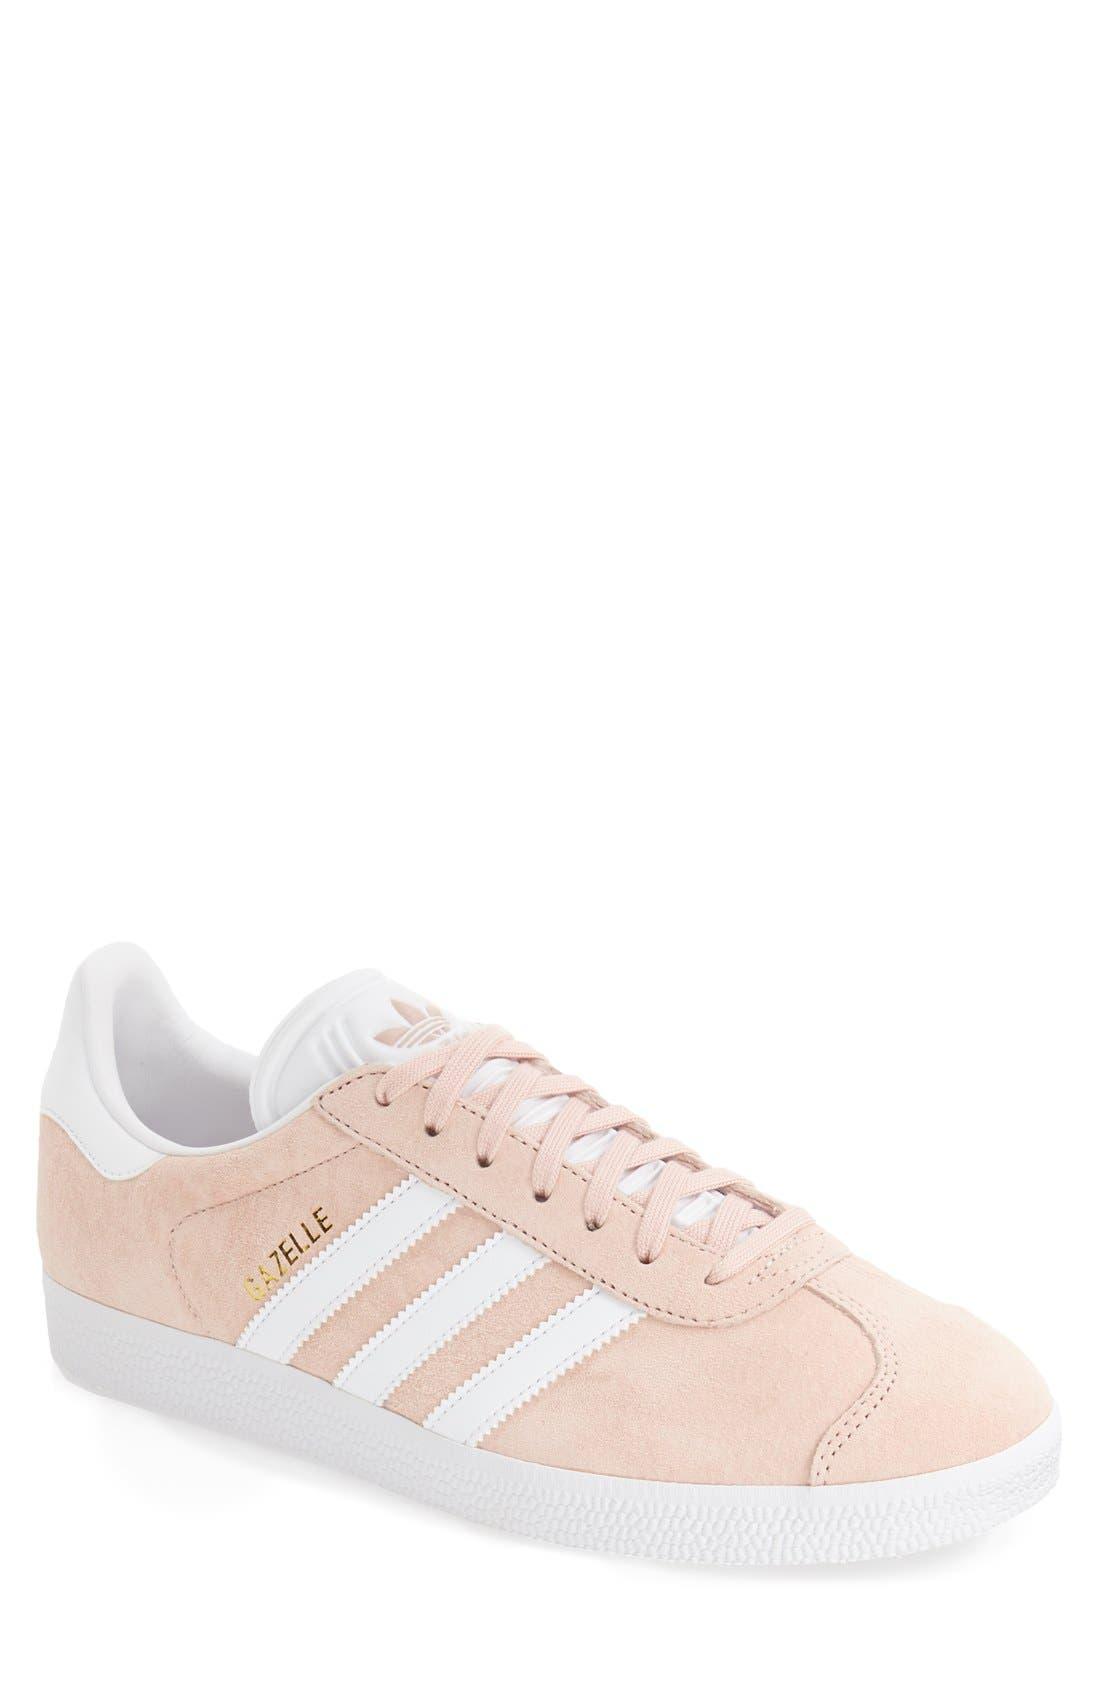 Gazelle Sneaker,                         Main,                         color, Vapor Pink